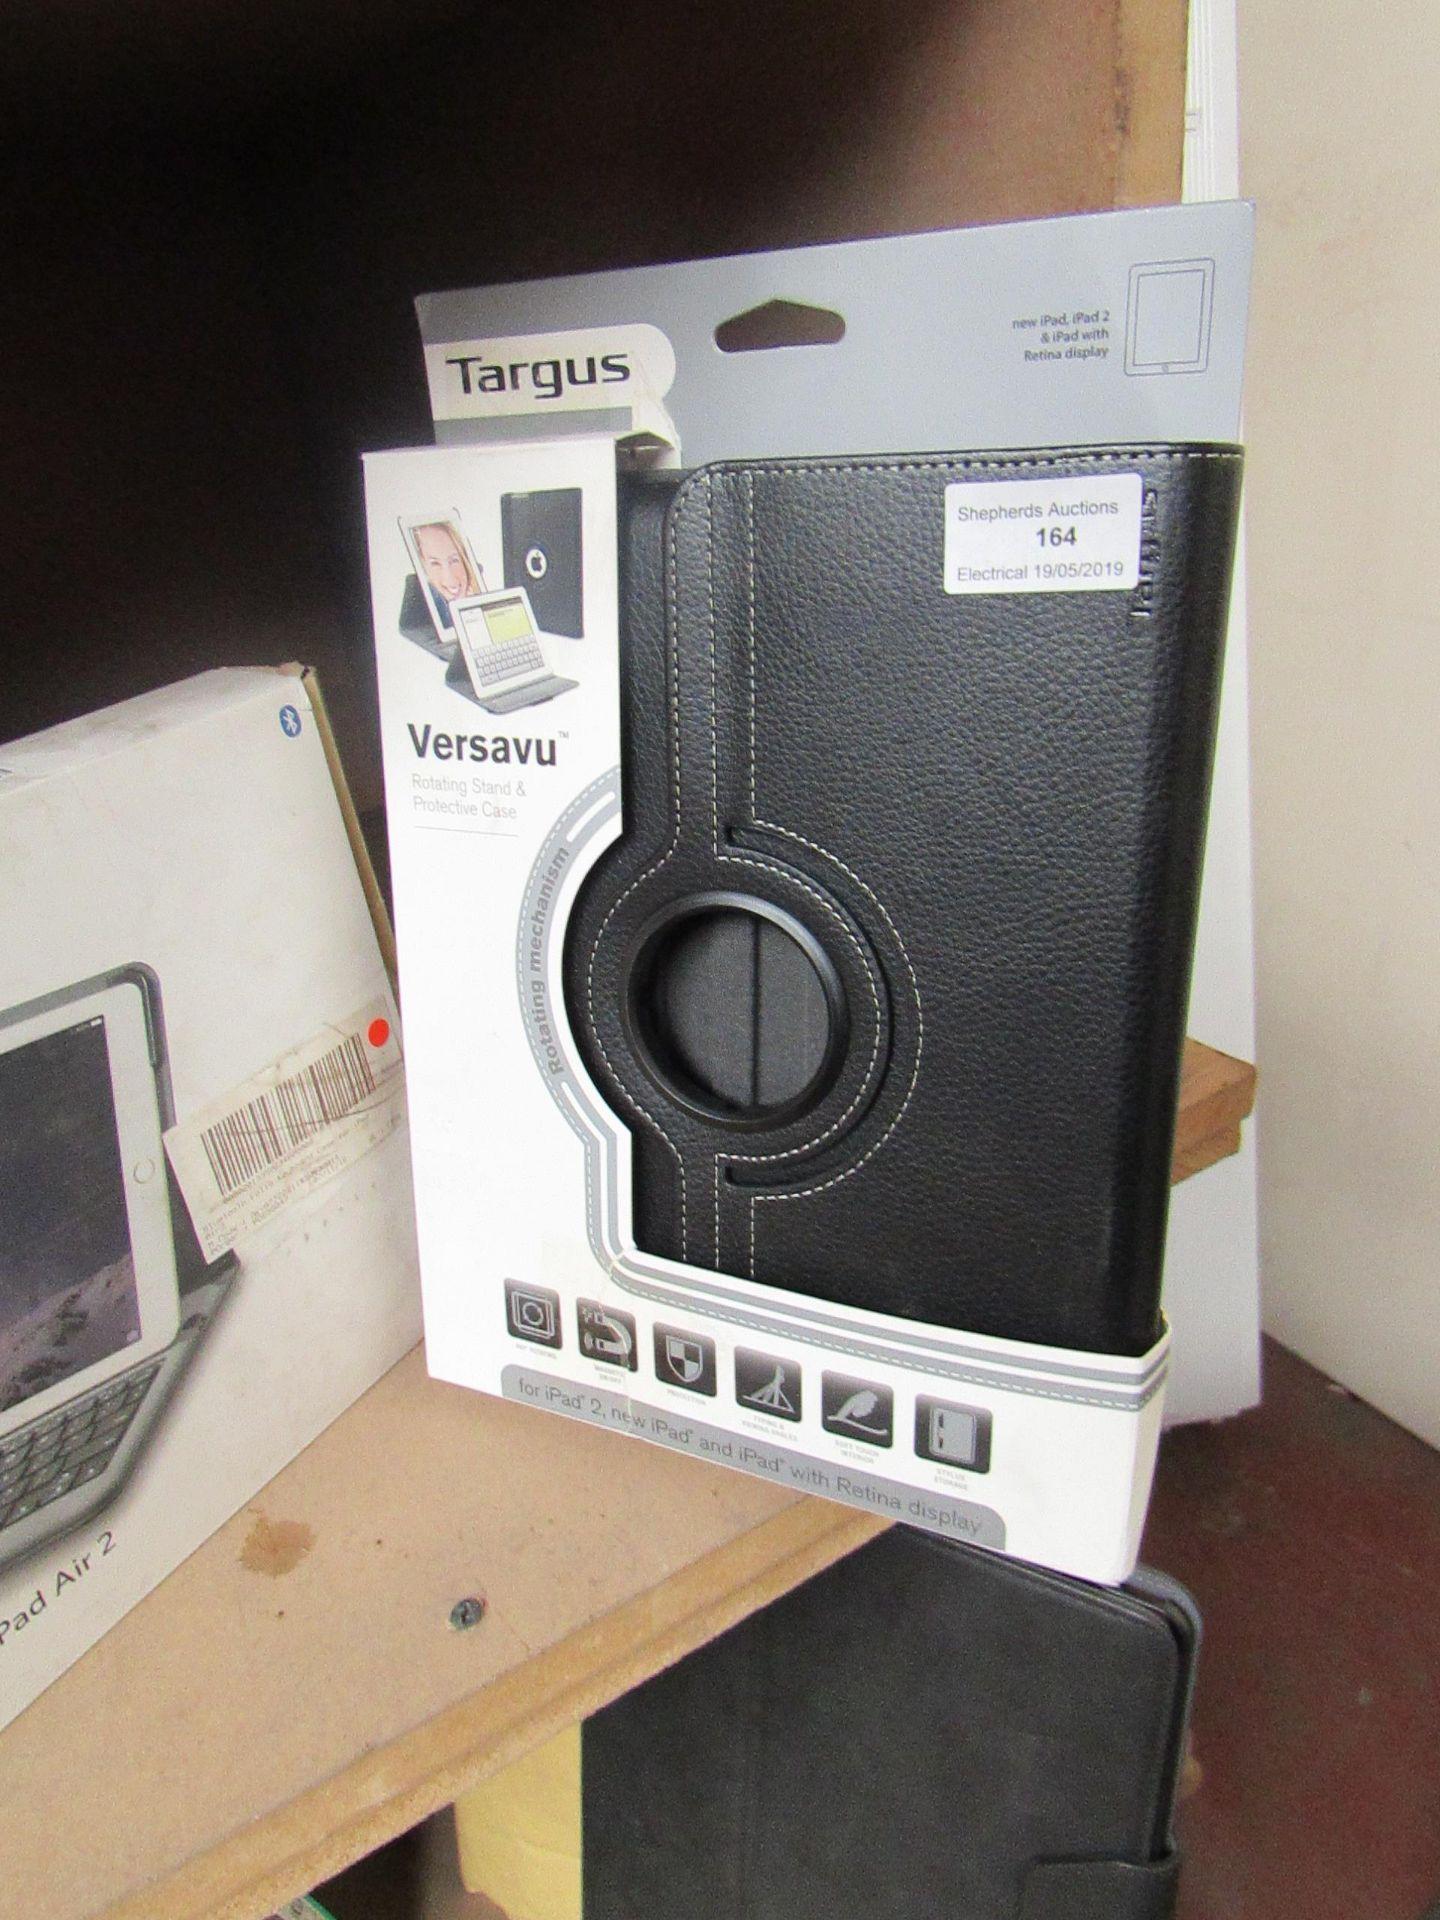 Lot 164 - Targus iPad 2 protectve case, grade B and boxed.